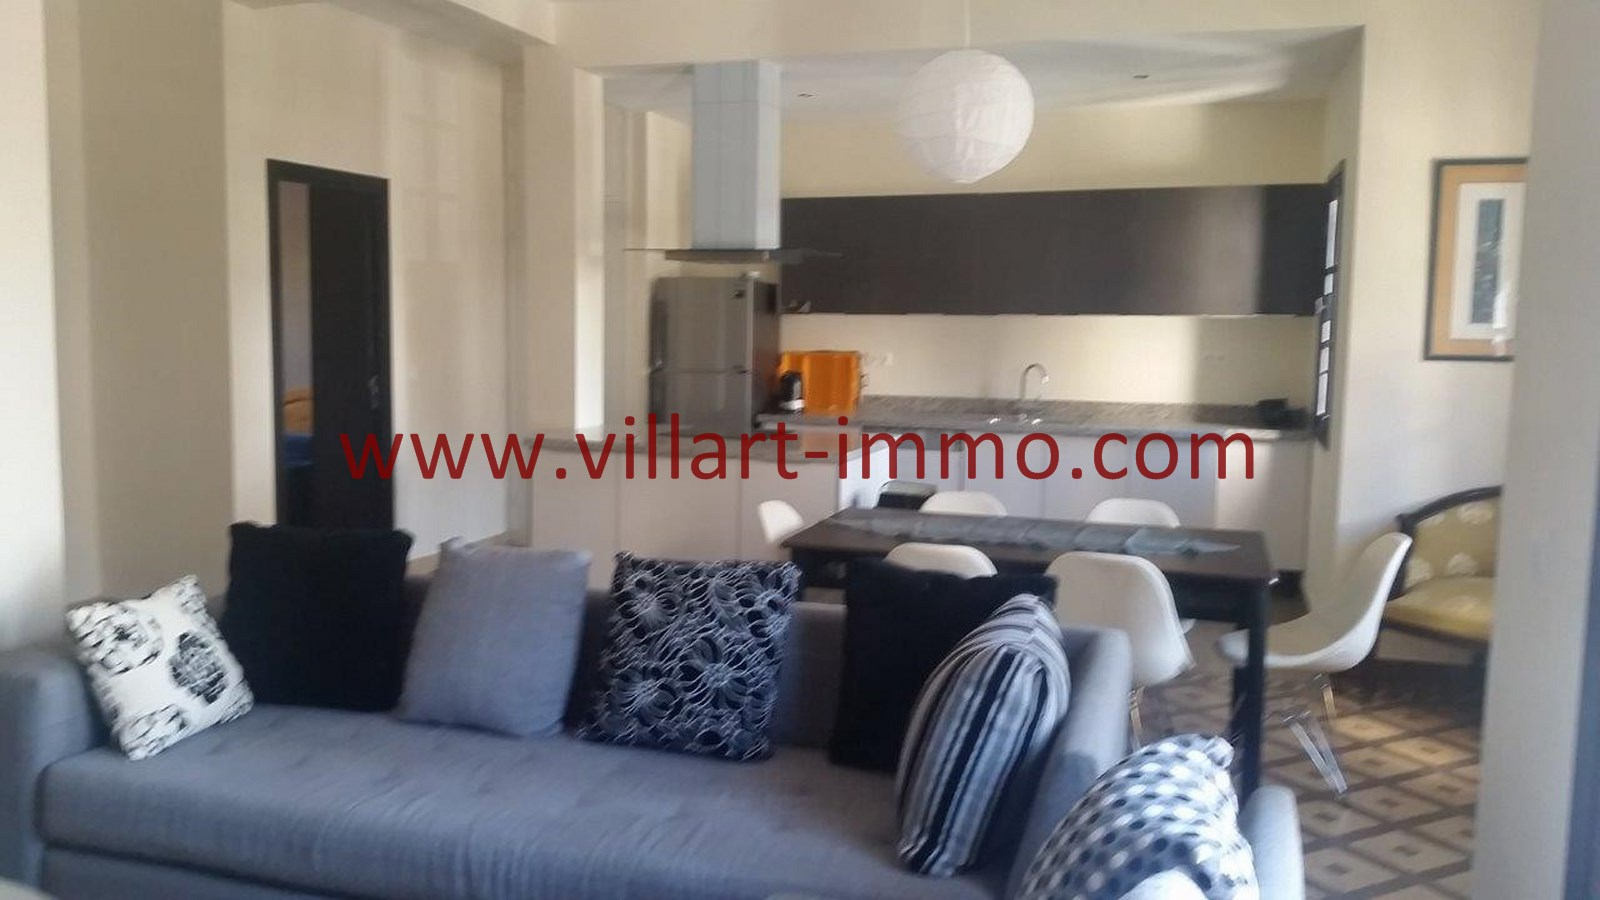 3-a-louer-appartement-meuble-centre-ville-tanger-salon-2-l964-villart-immo